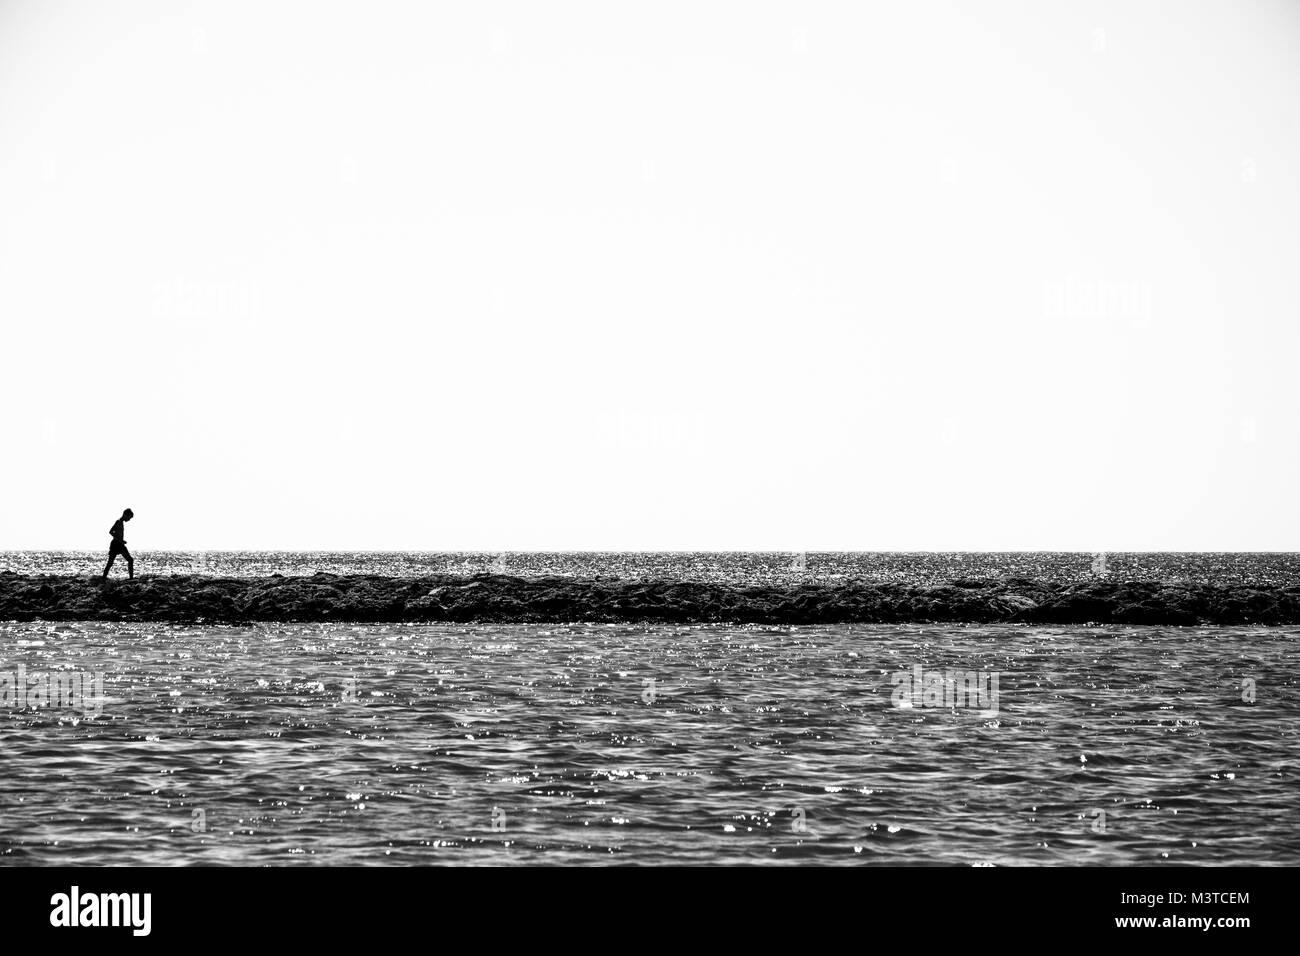 Lonely child walks on a thin coastline minimalistic black and white photo stock